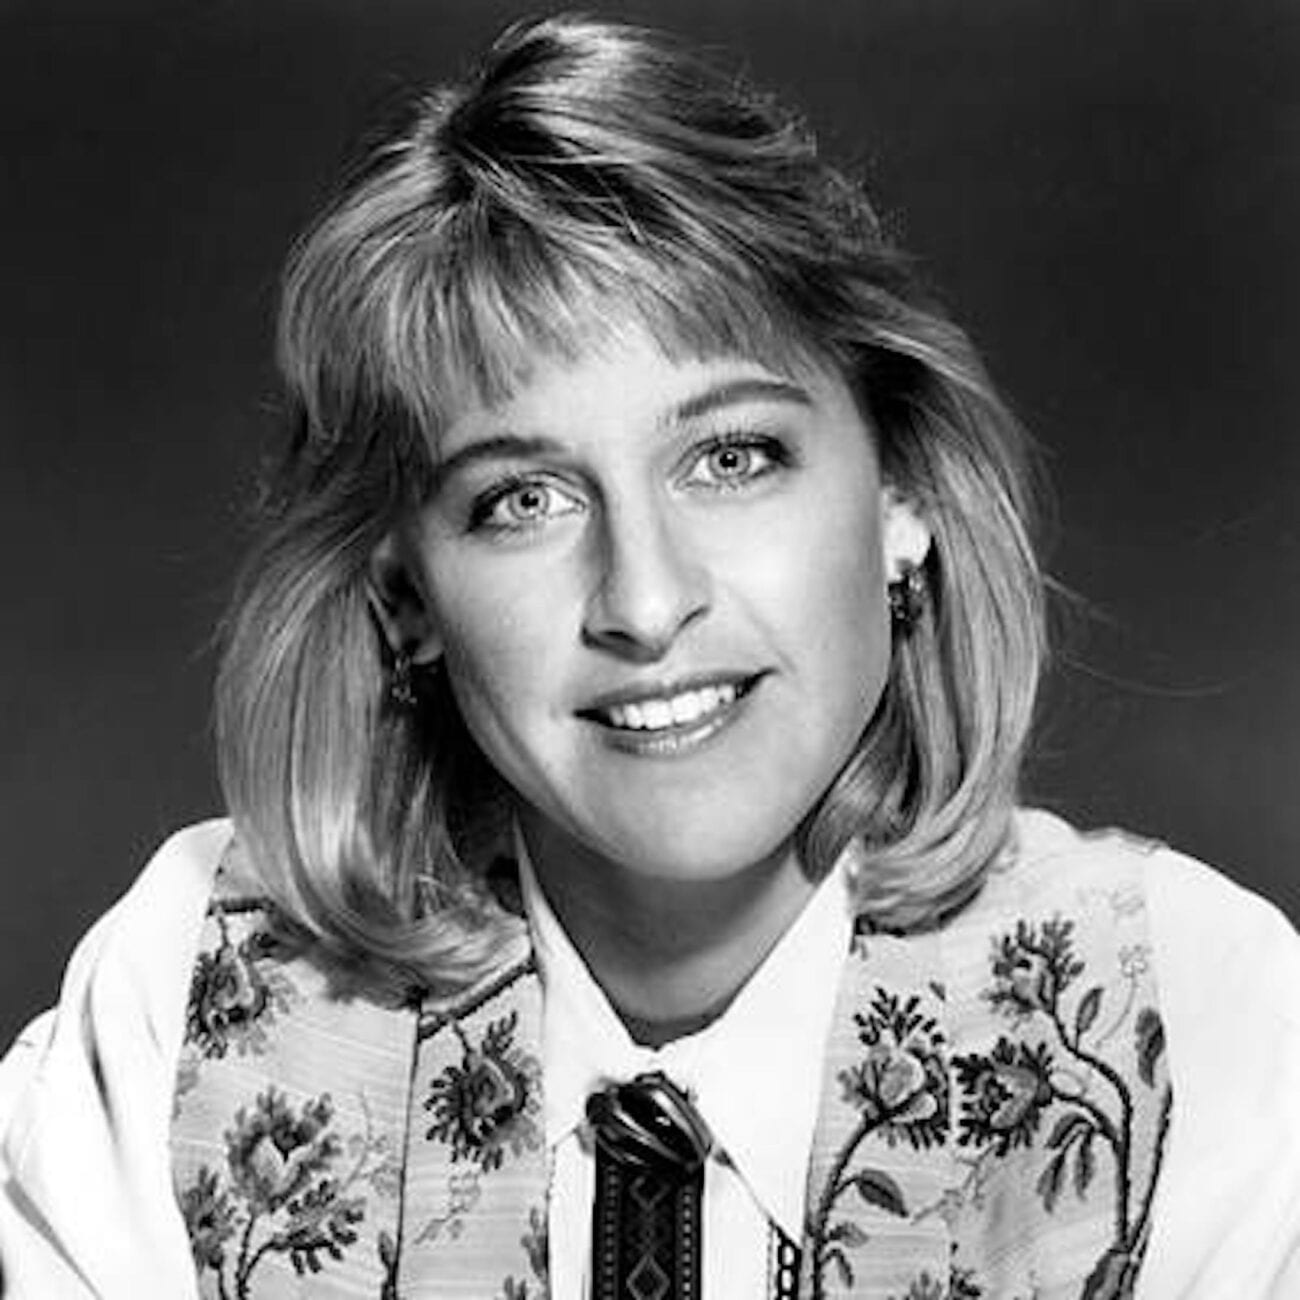 Ellen DeGeneres has long been considered a beloved celebrity. Is Ellen DeGeneres mean? Here's a timeline showing her rise to fame and scandal.